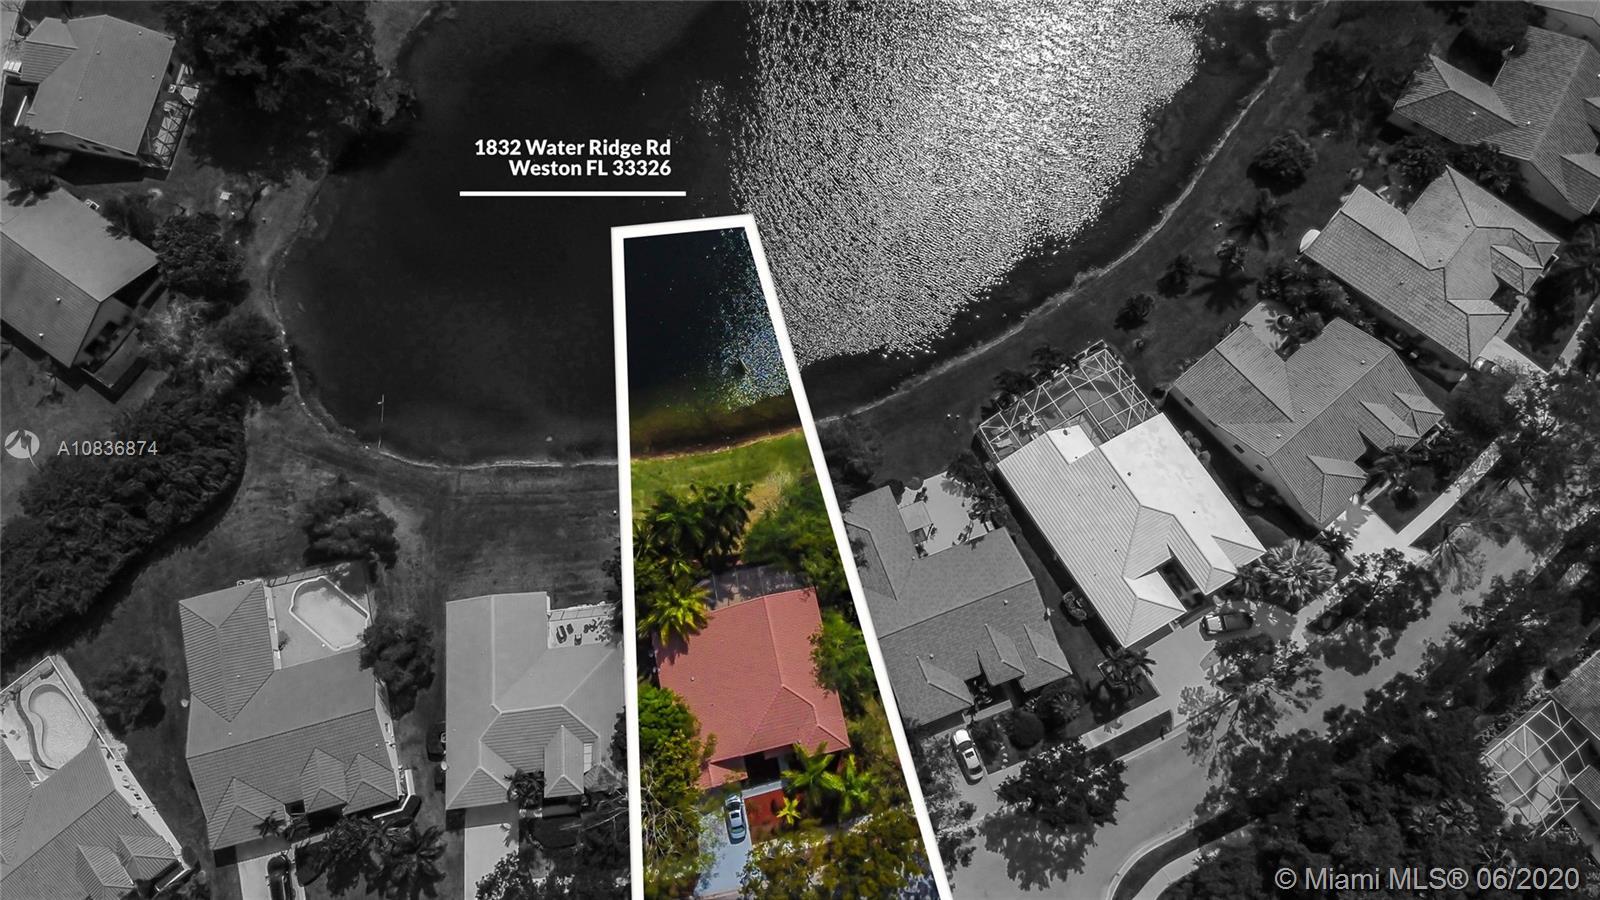 Photo - 1832 Water Ridge Dr, Weston FL 33326